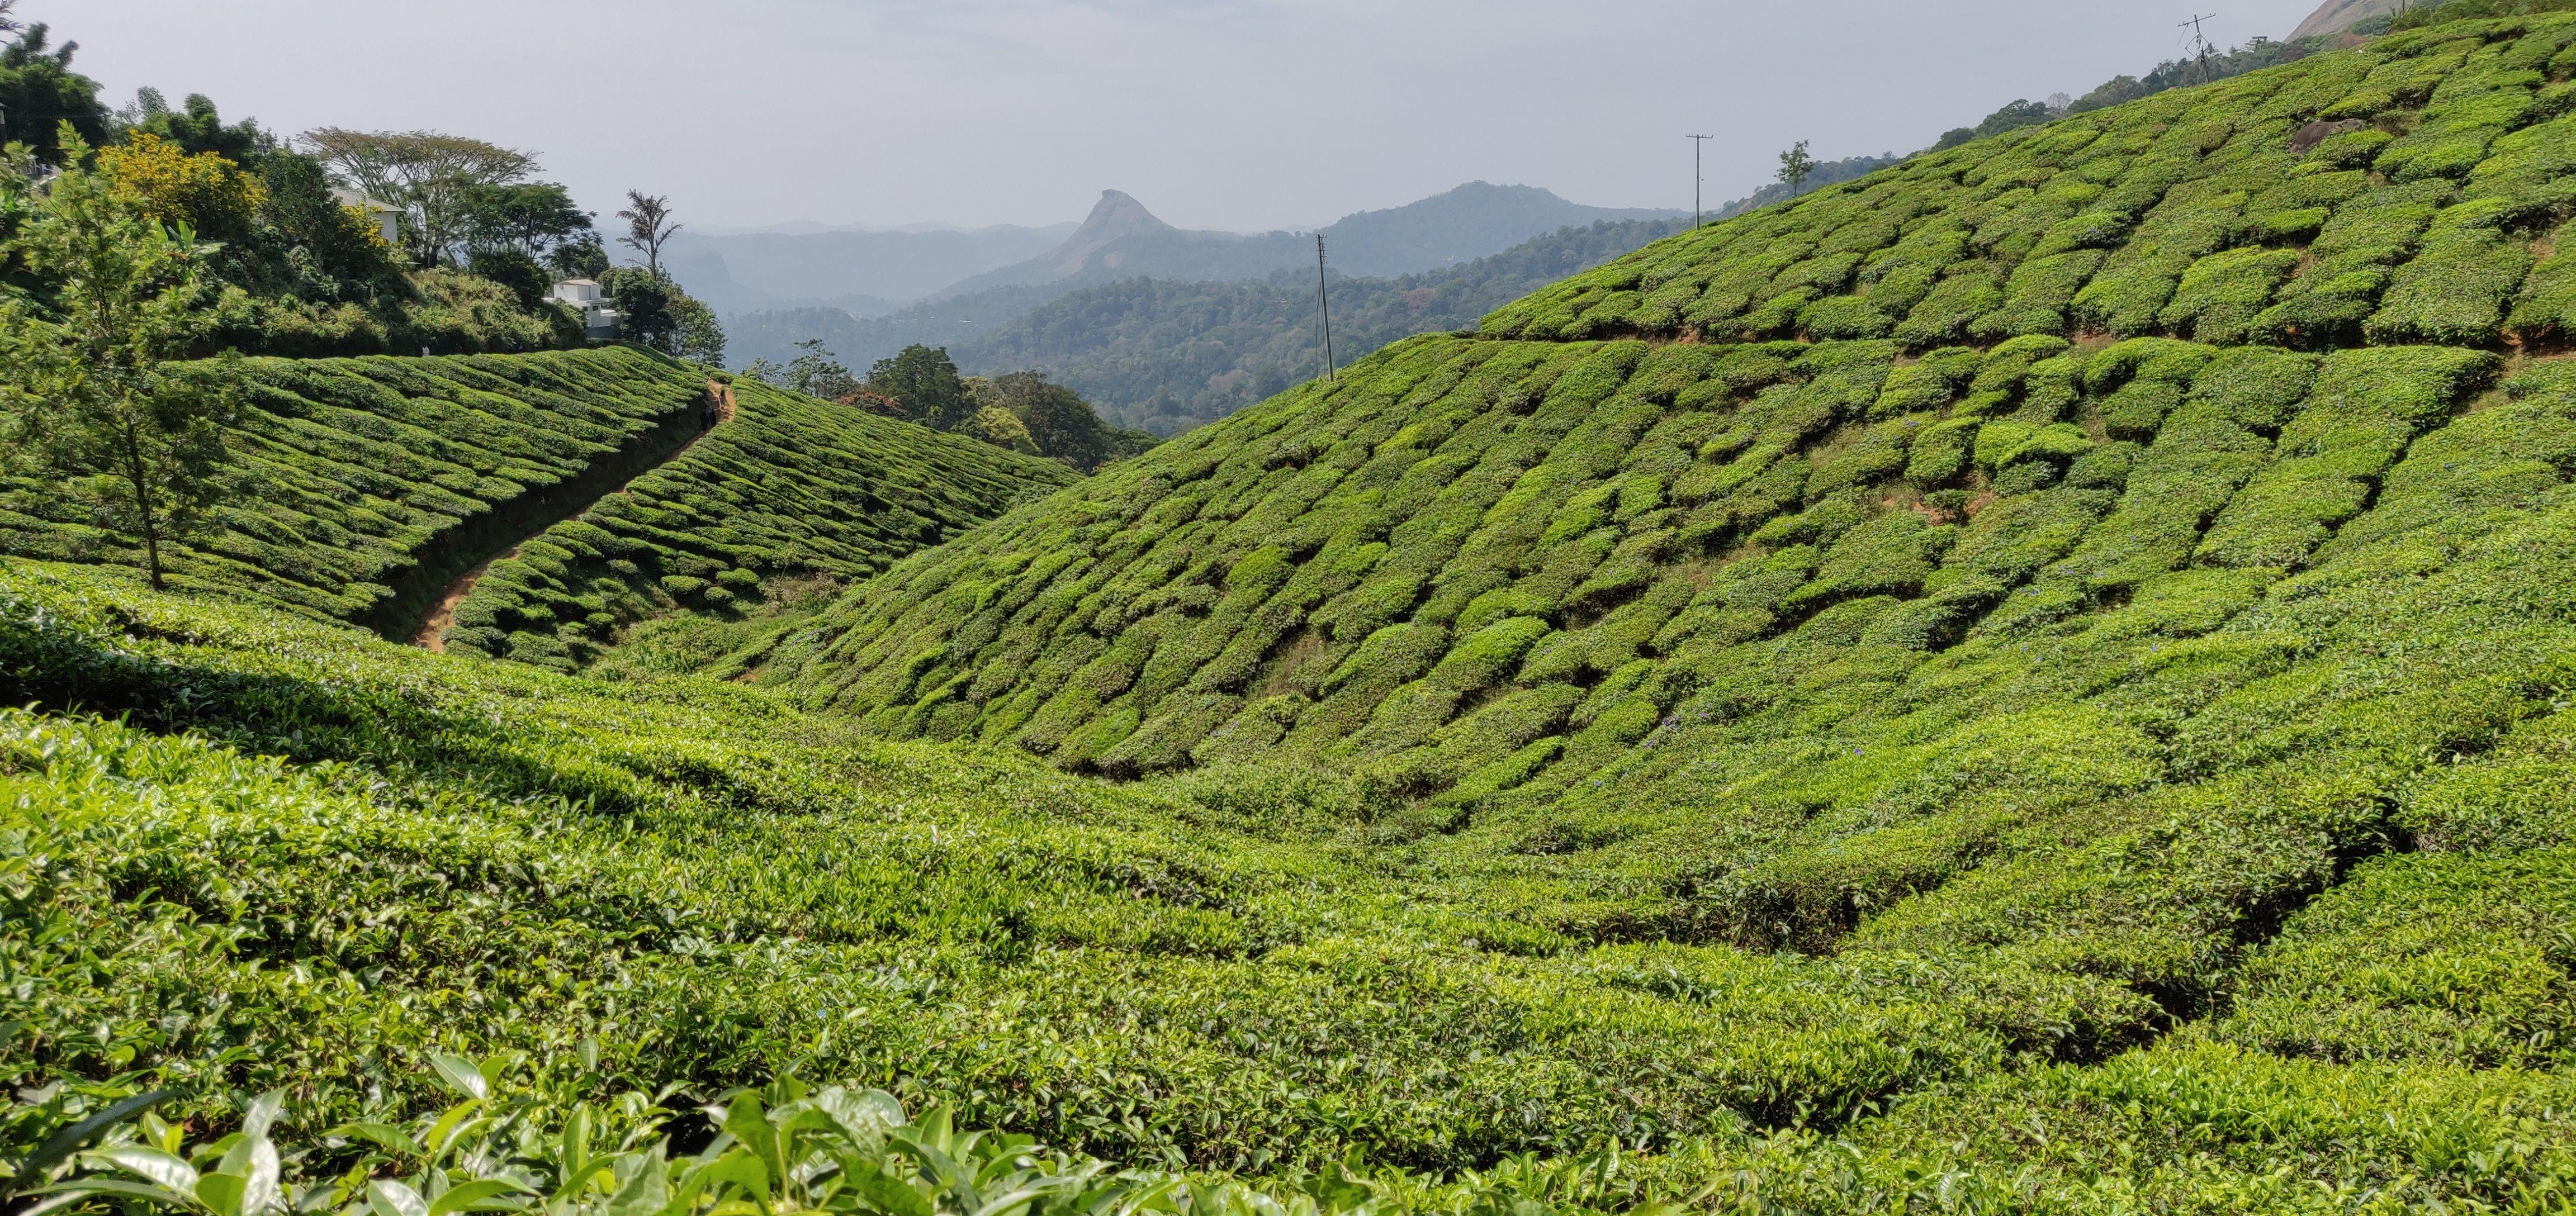 Munnar Tea Gardens in 2020 Scenic waterfall, Munnar, Scenic